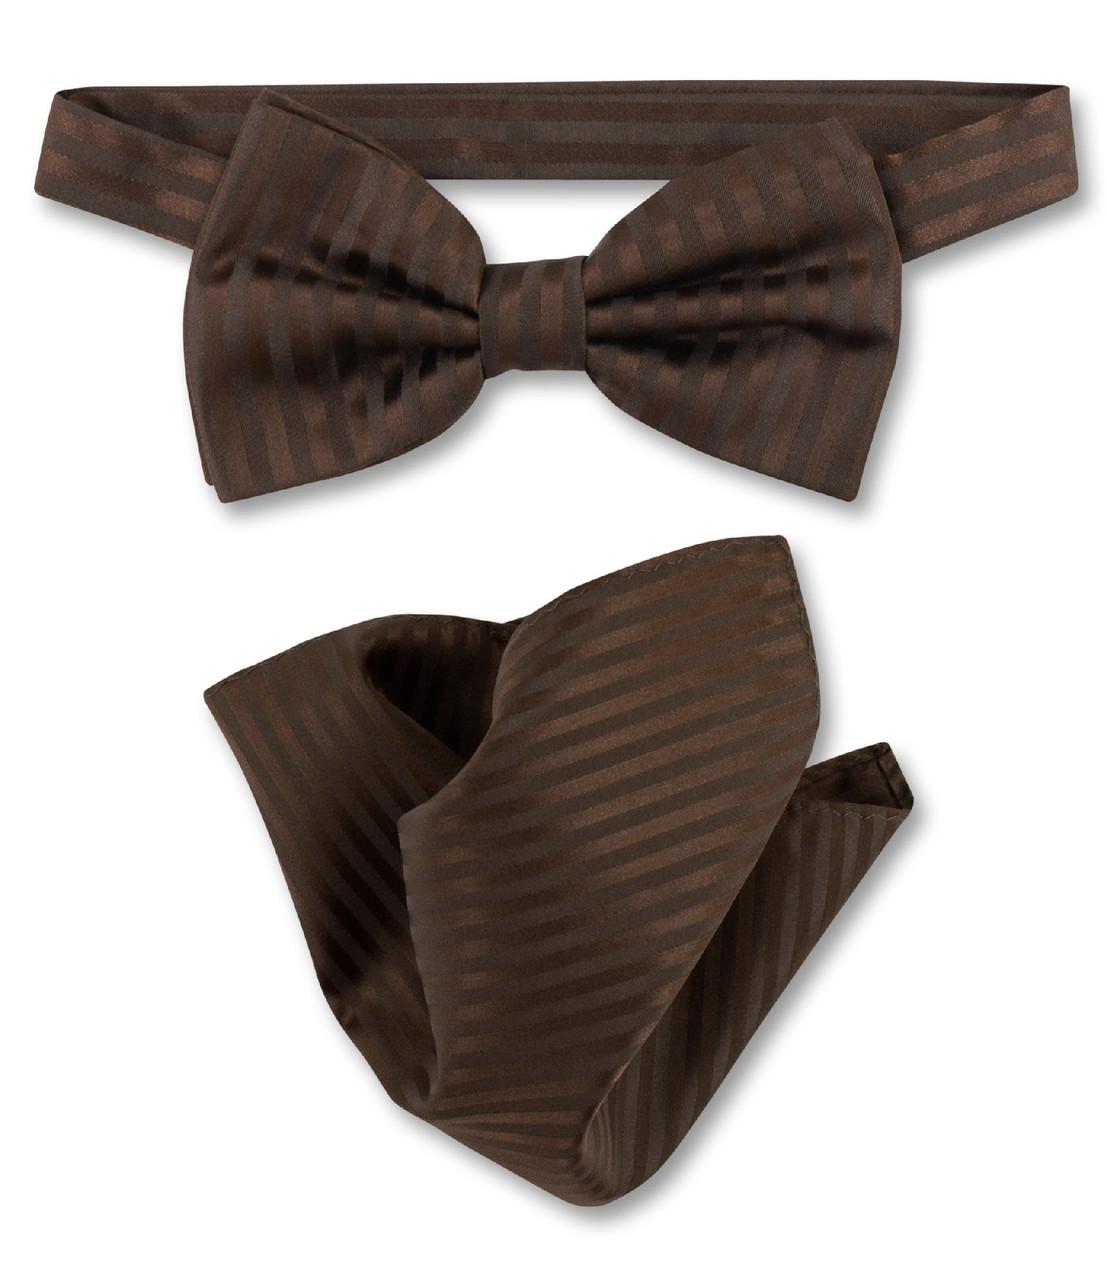 87bb2643a5e2 Chocolate Brown Vertical Stripe Bow Tie Handkerchief Set For Men